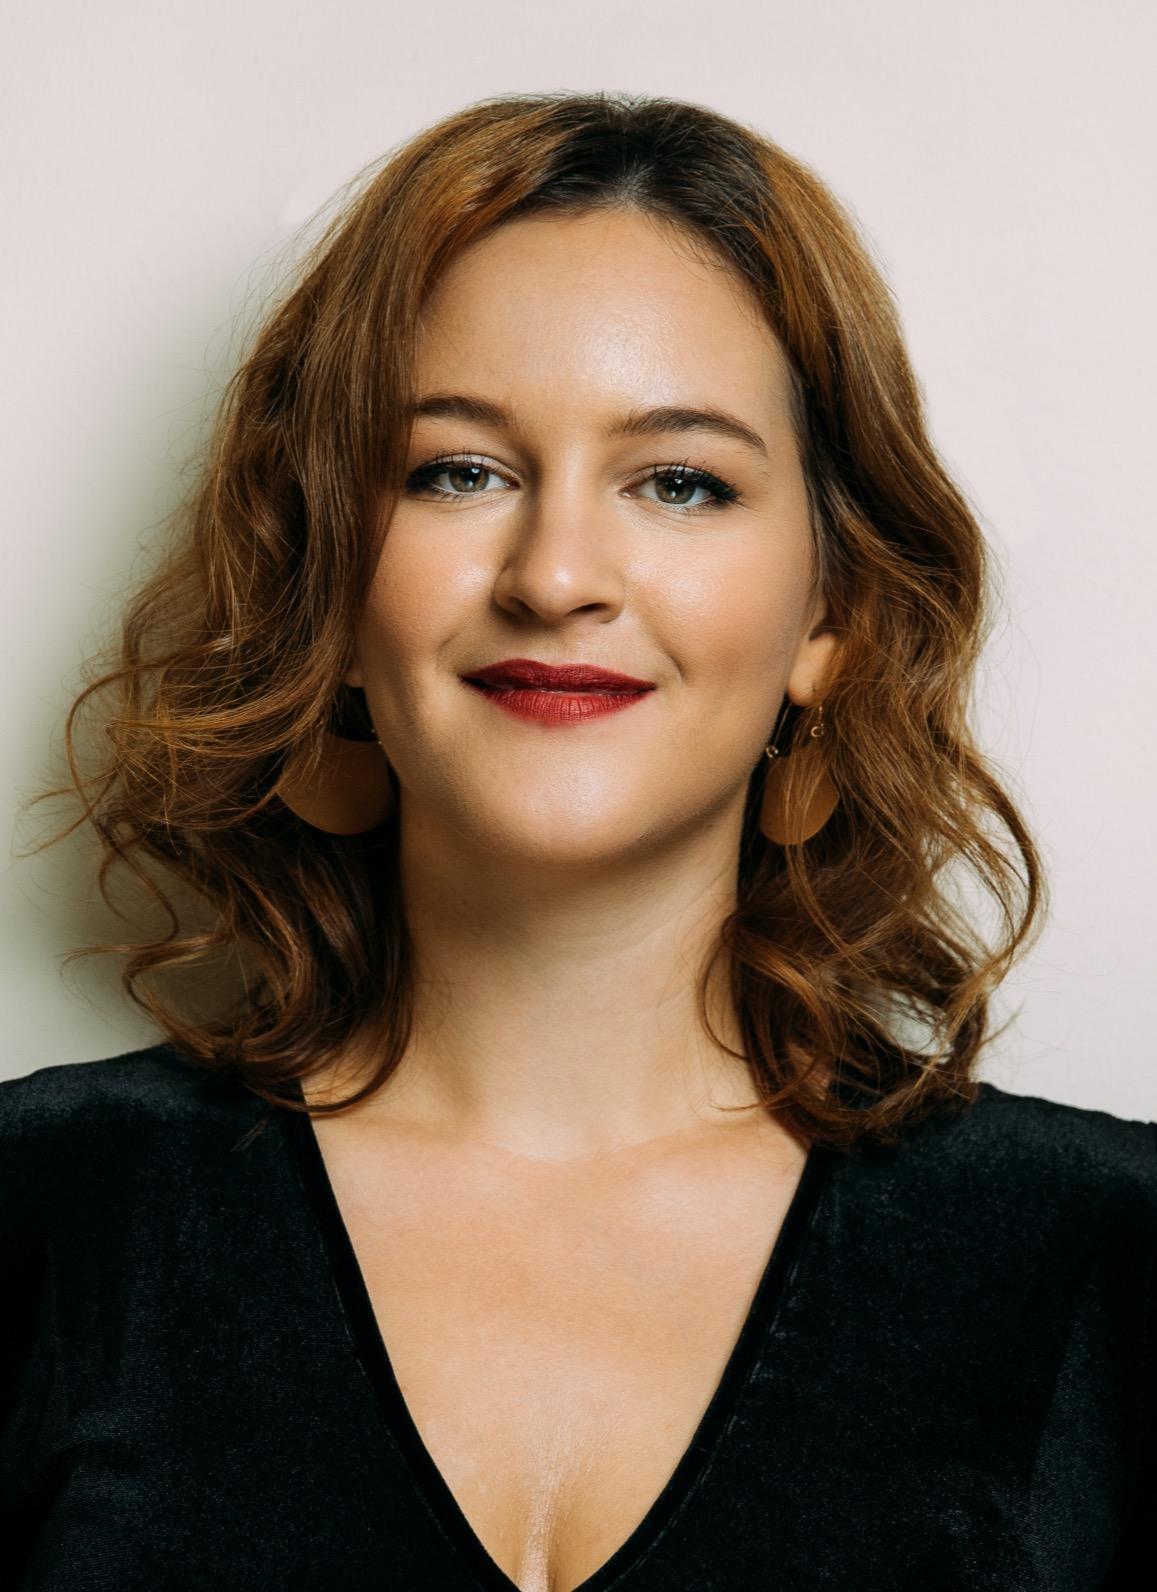 Anna Overbeck